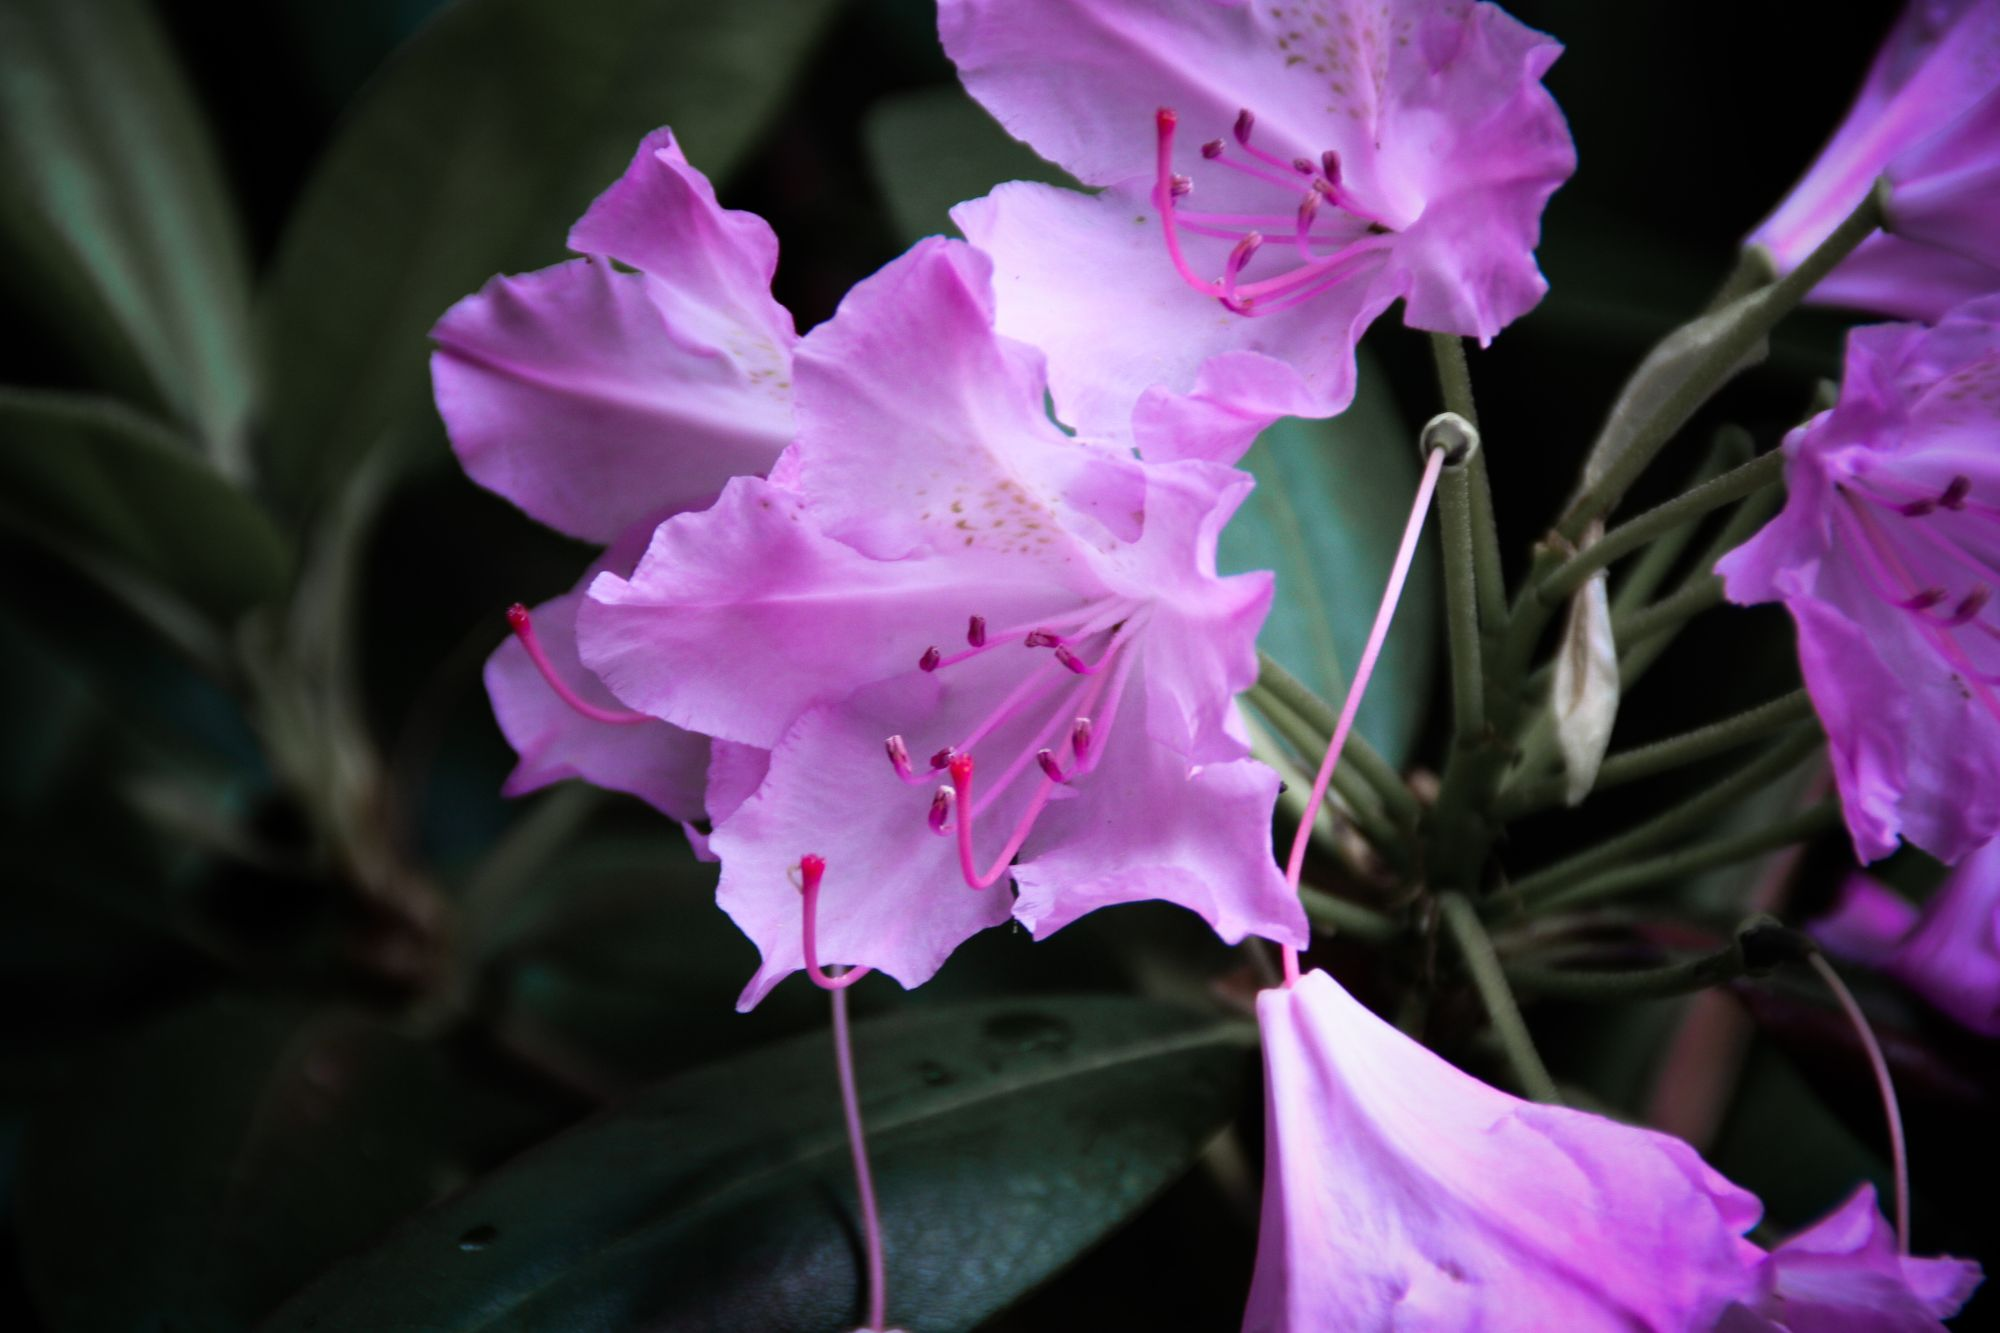 01) Flowers